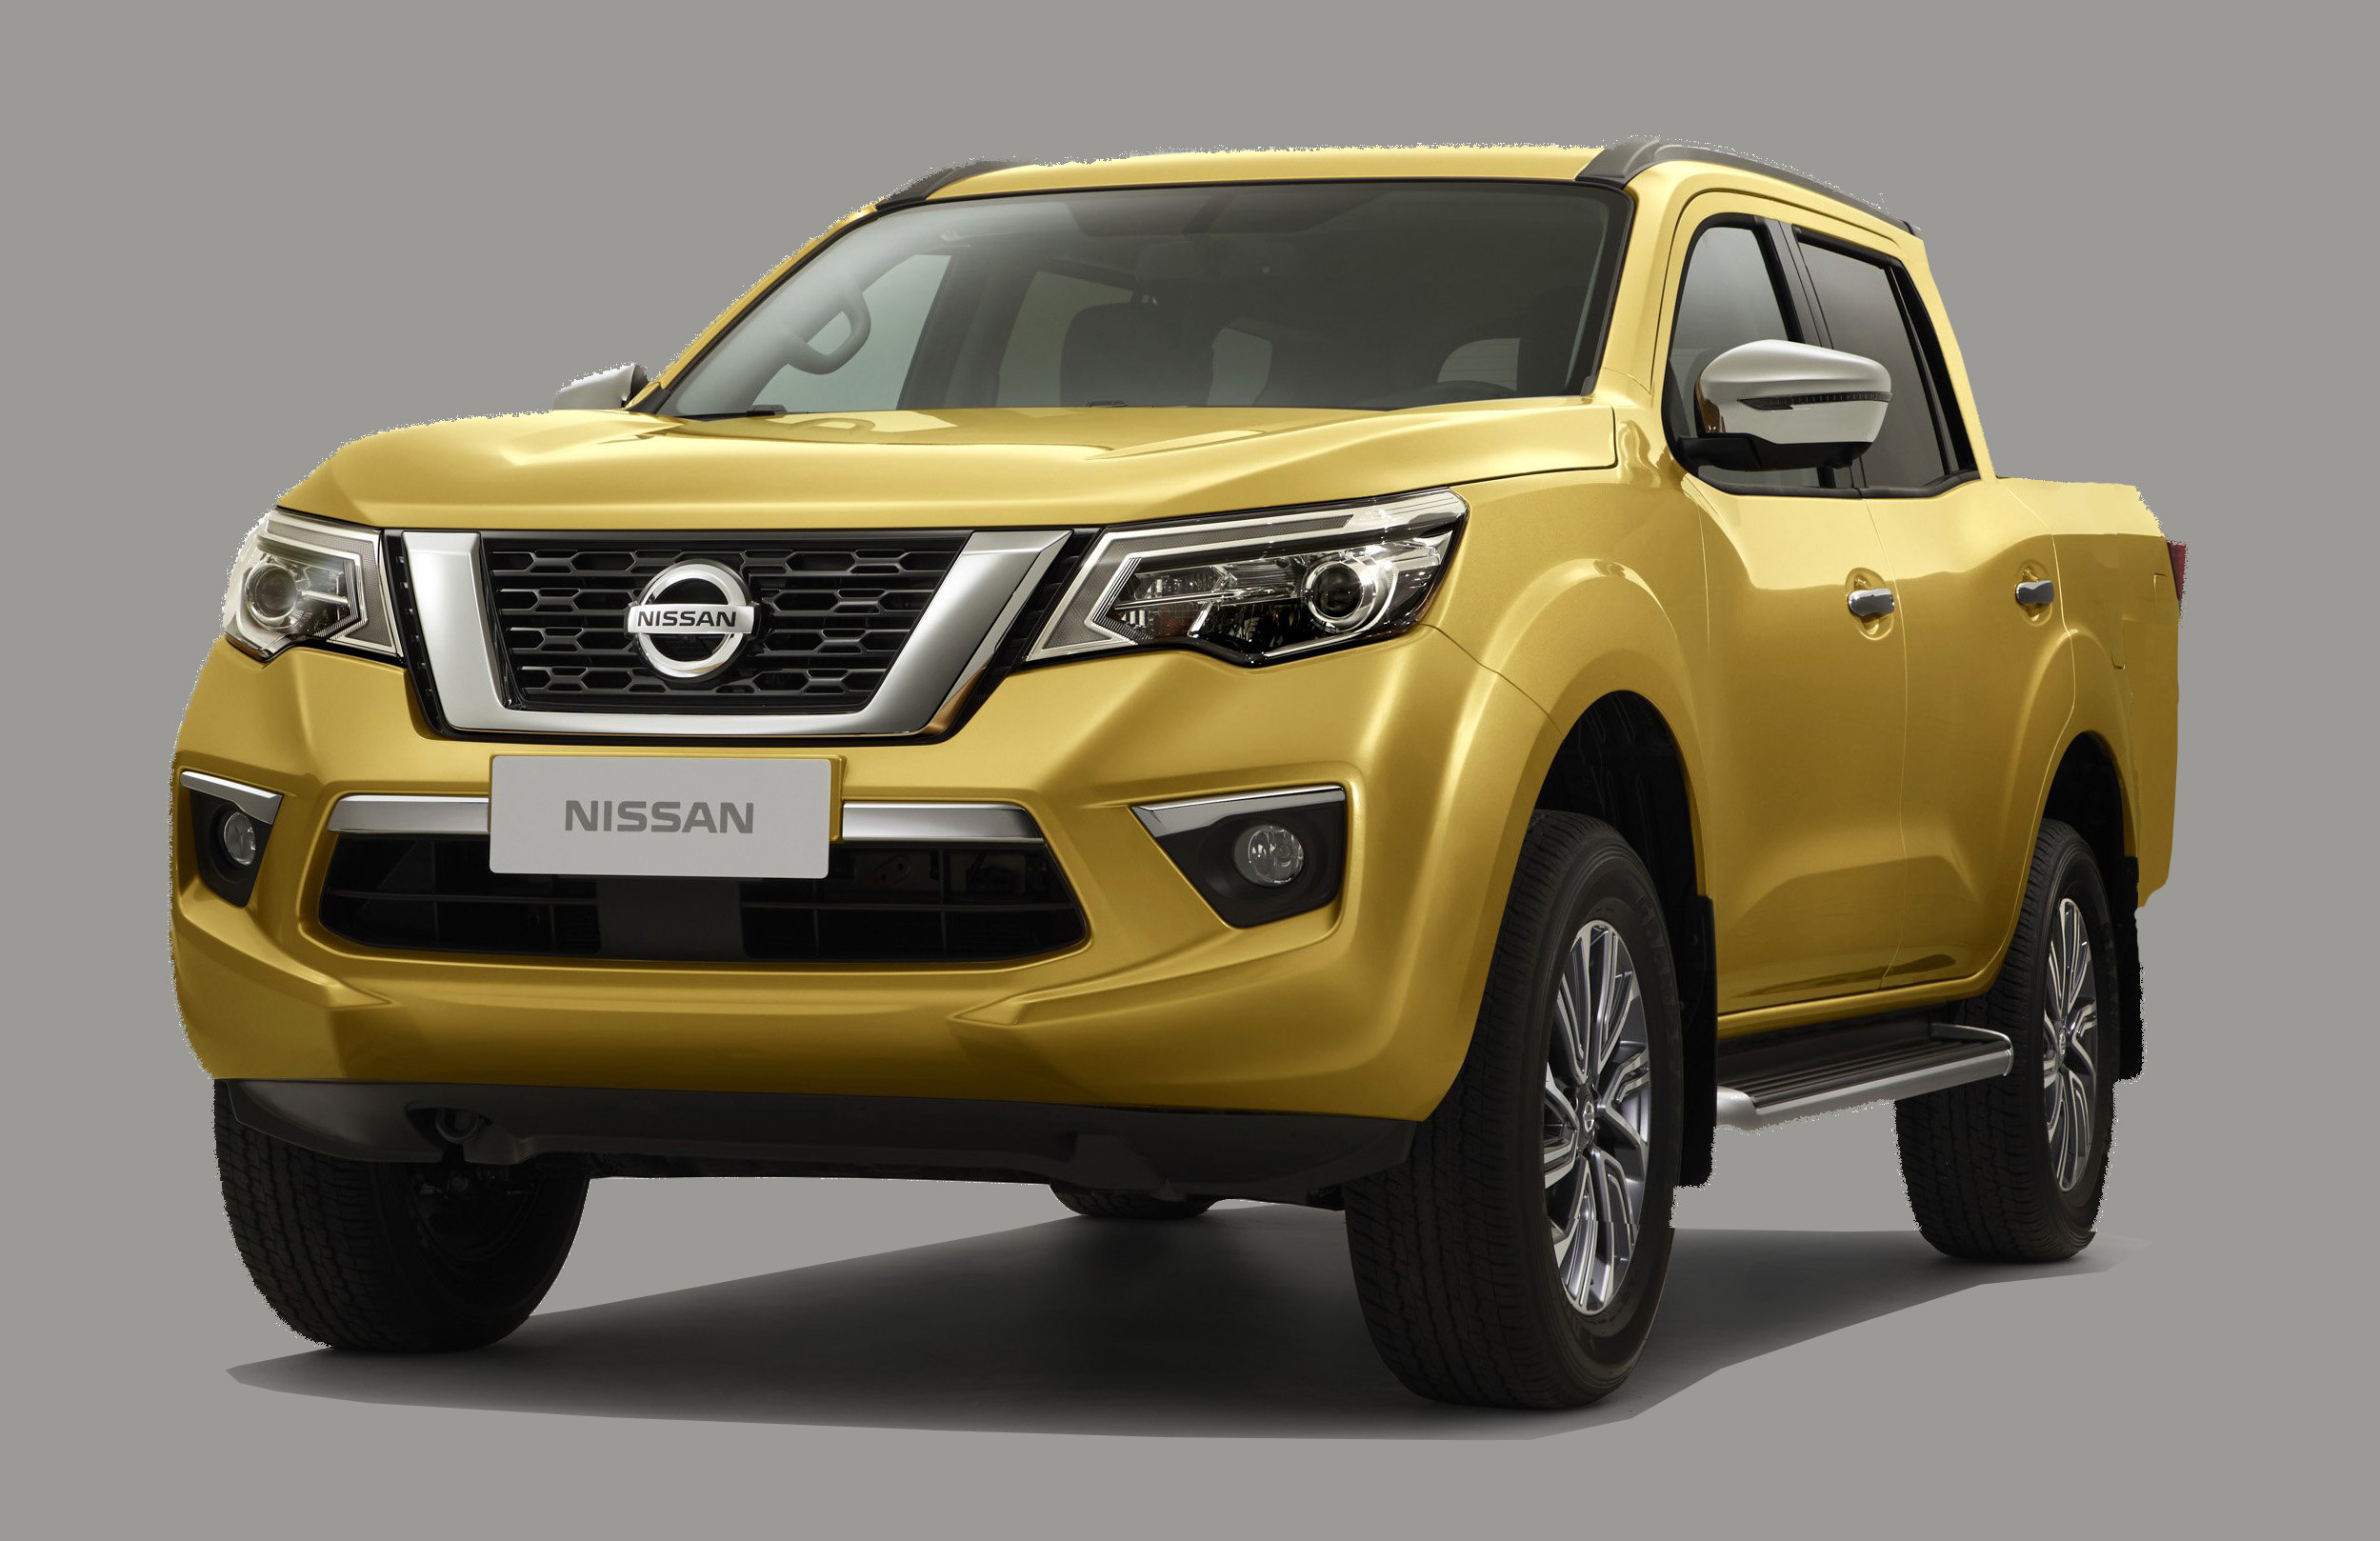 82 New Nissan Navara 2020 Model Review by Nissan Navara 2020 Model